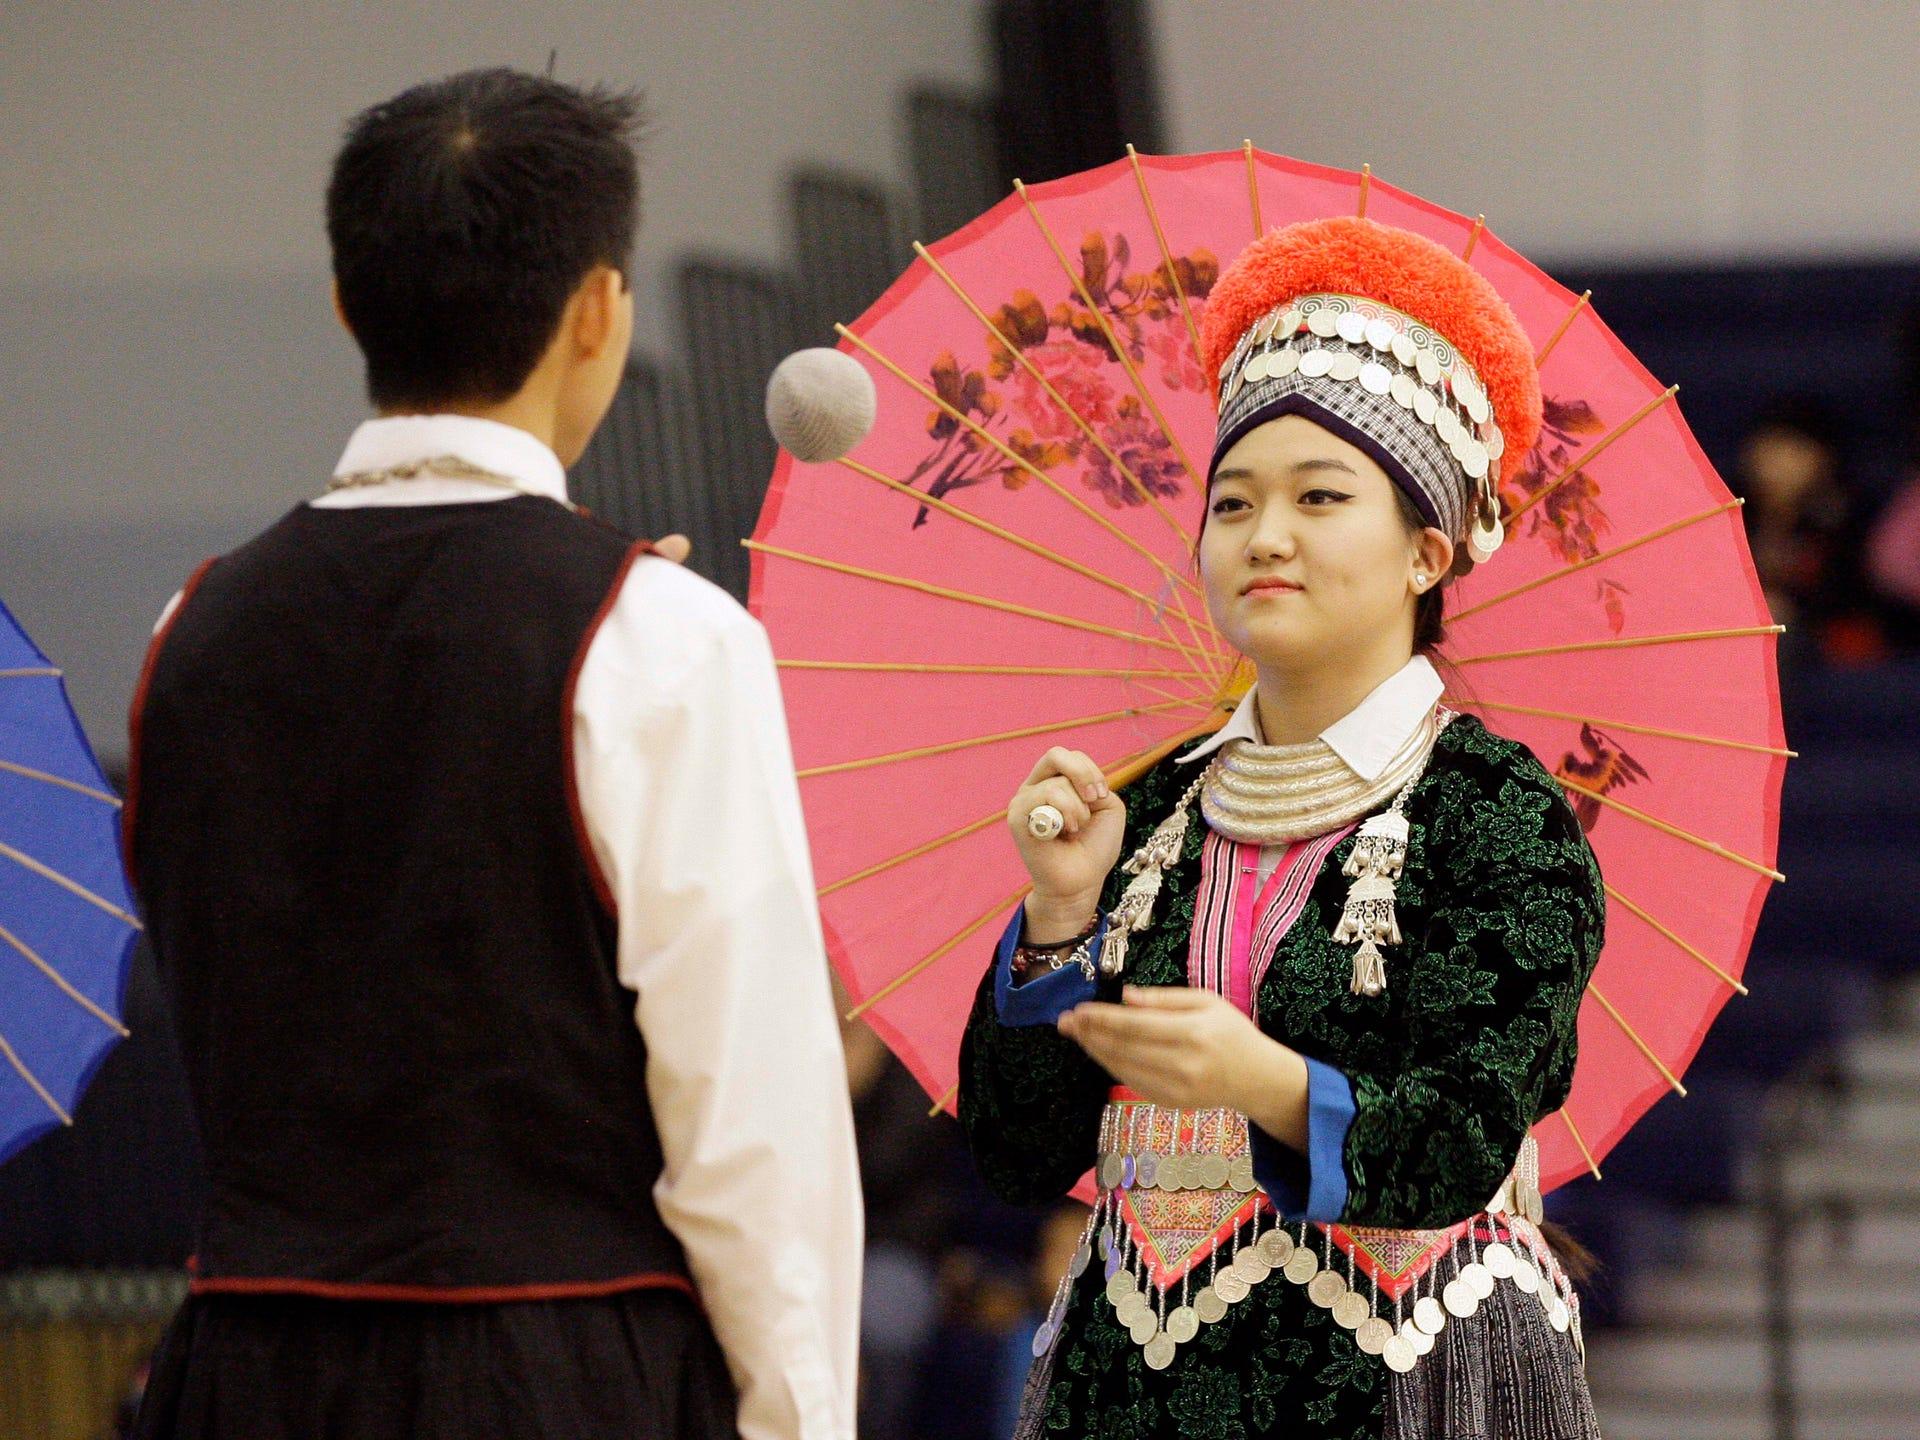 Hmong community celebrates the Hmong New Year in Sheboygan